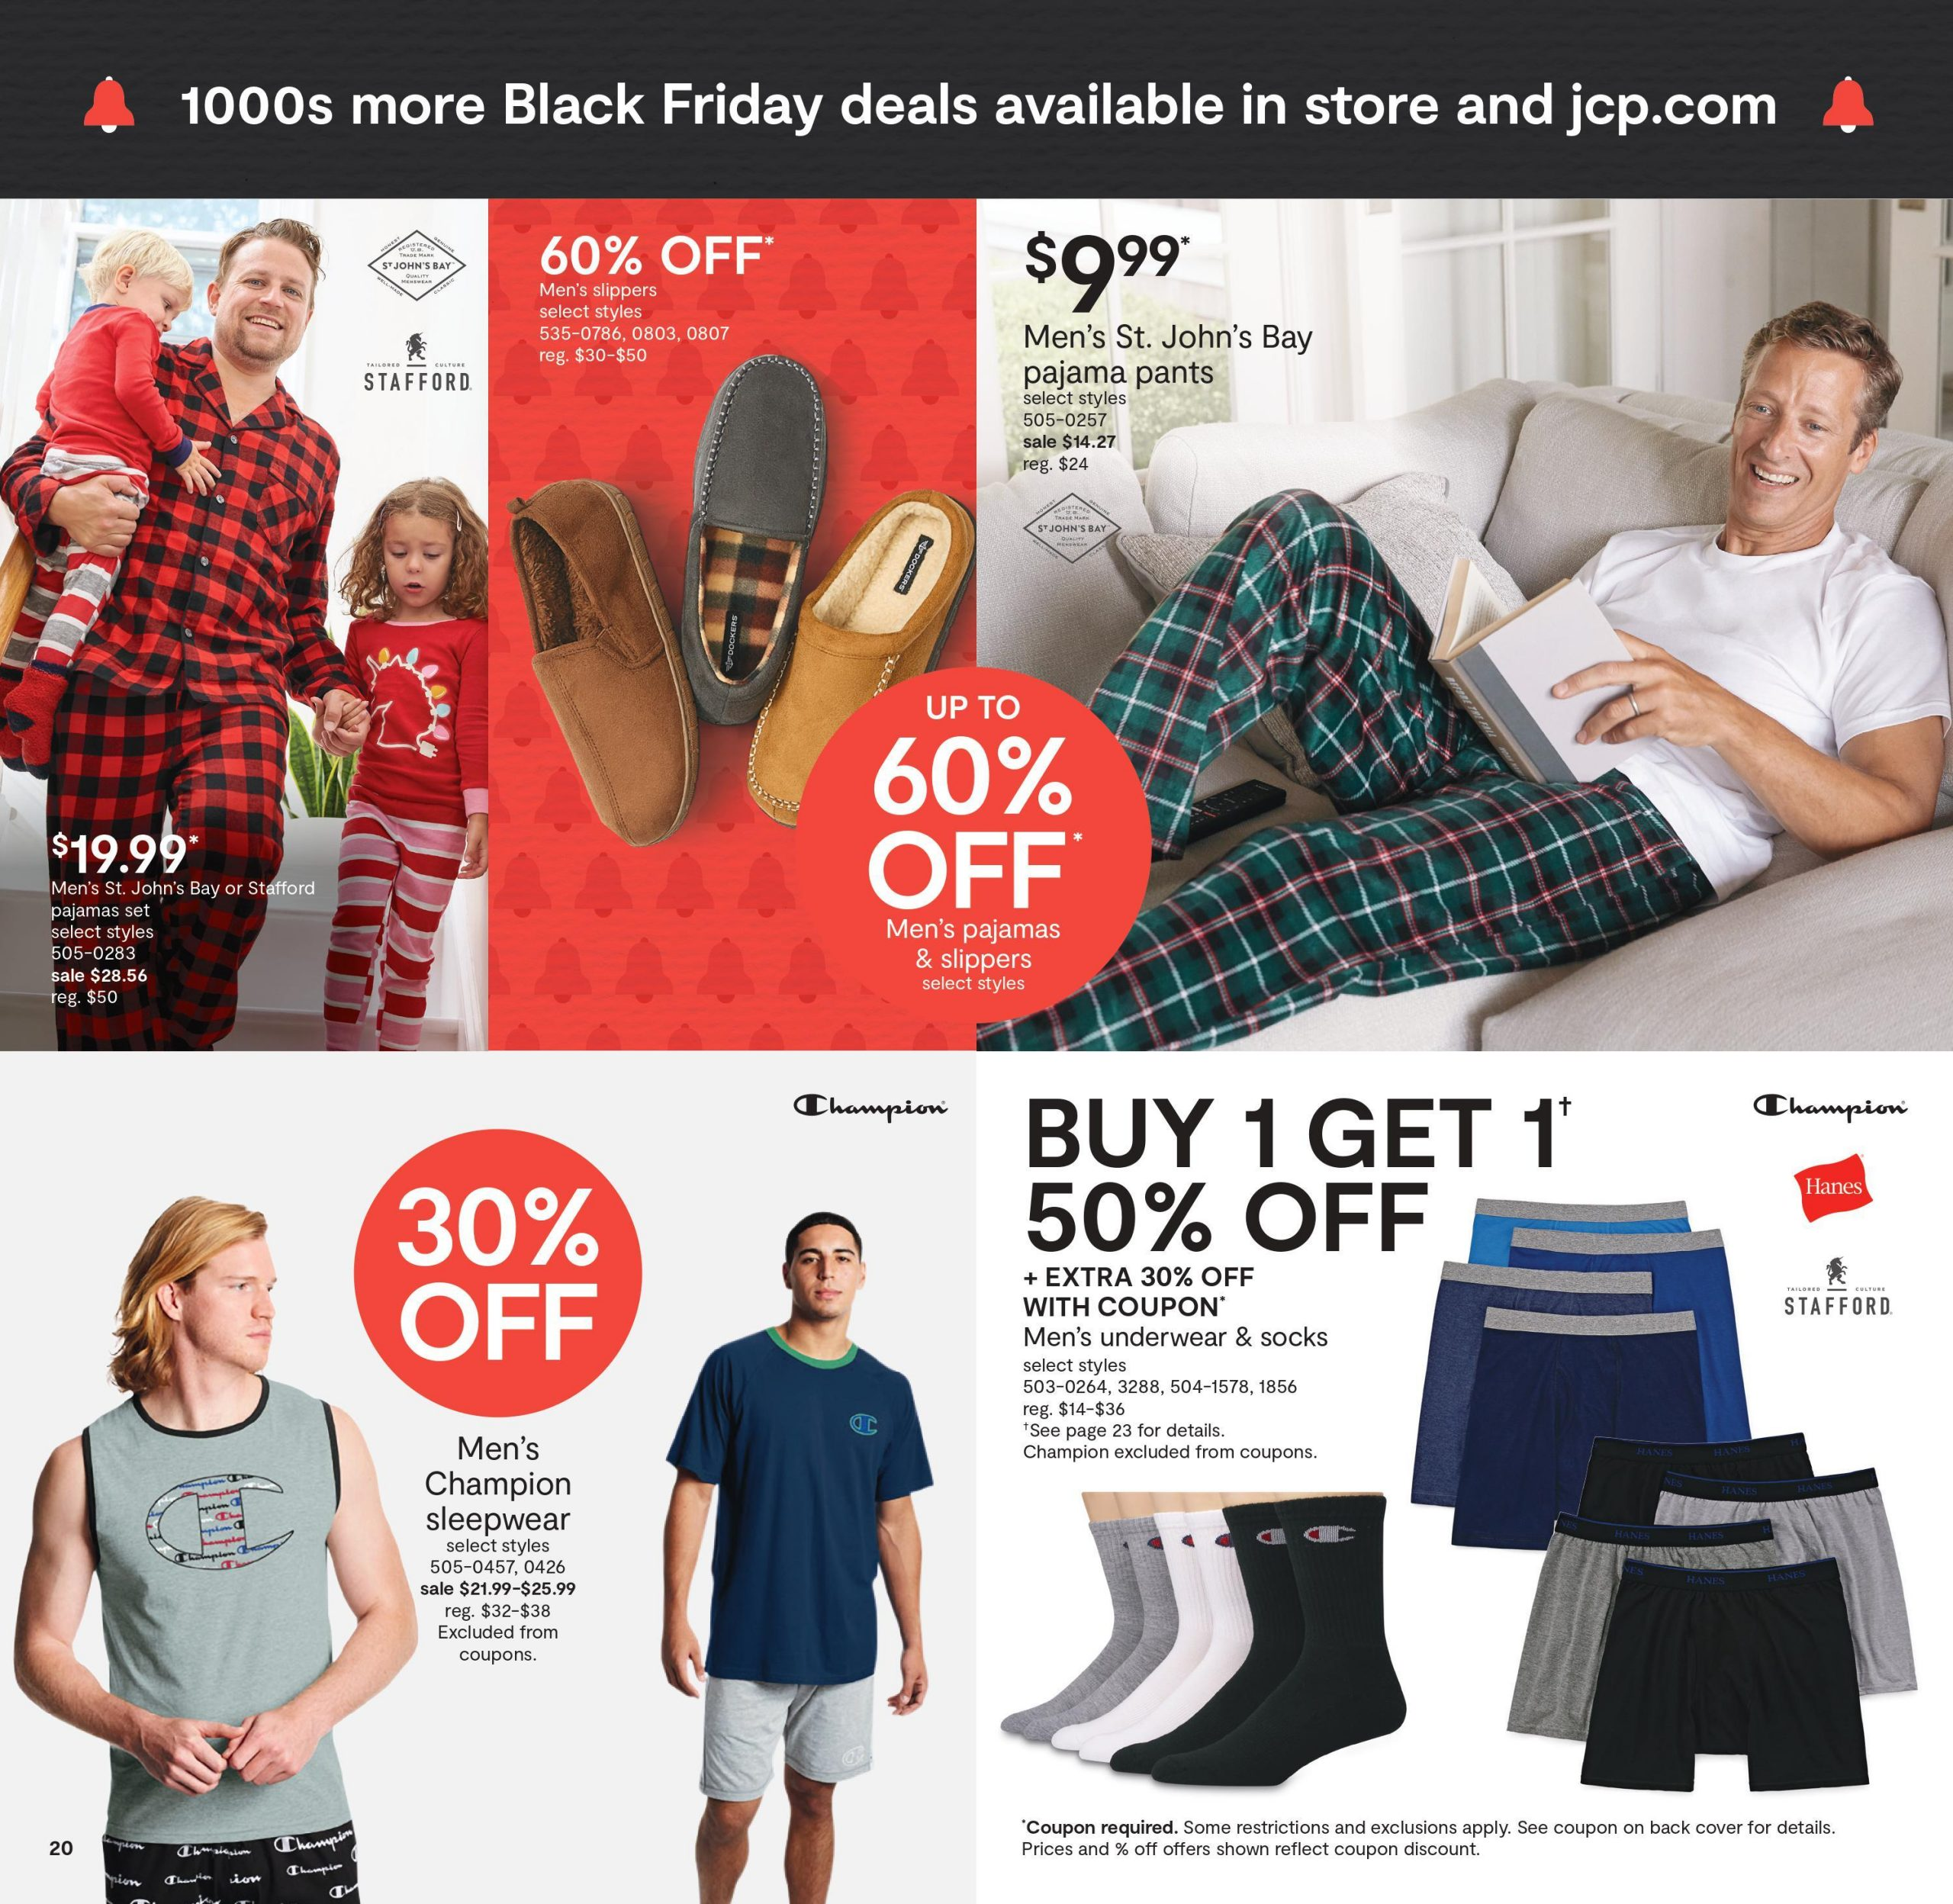 JC Penney Black Friday 2020 Ad